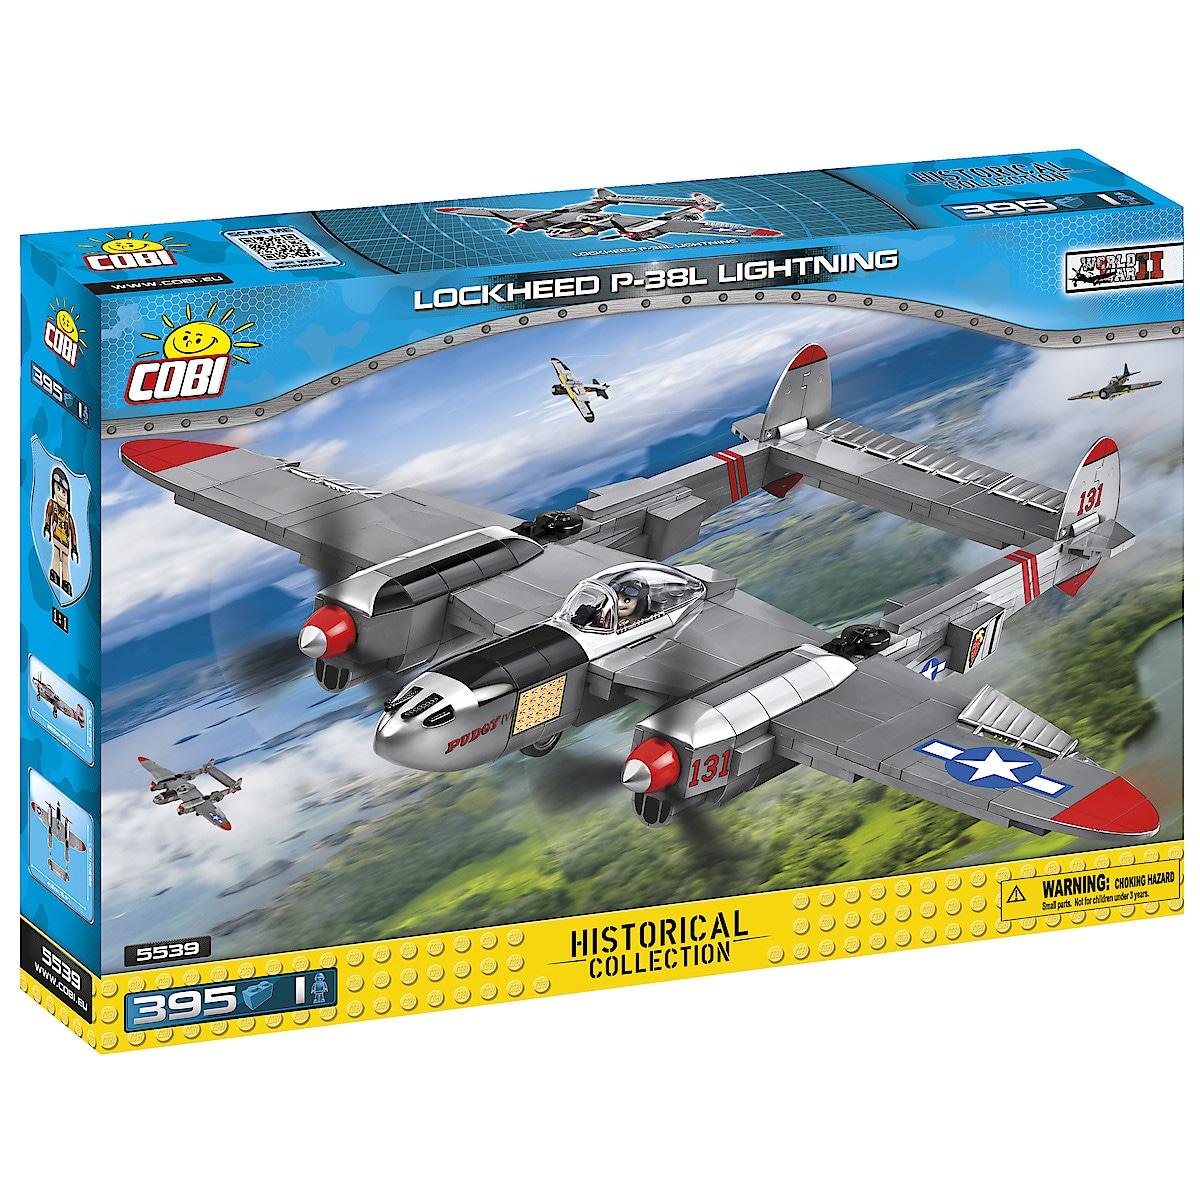 Rakennussarja Cobi, Lockheed P-38L Lightning